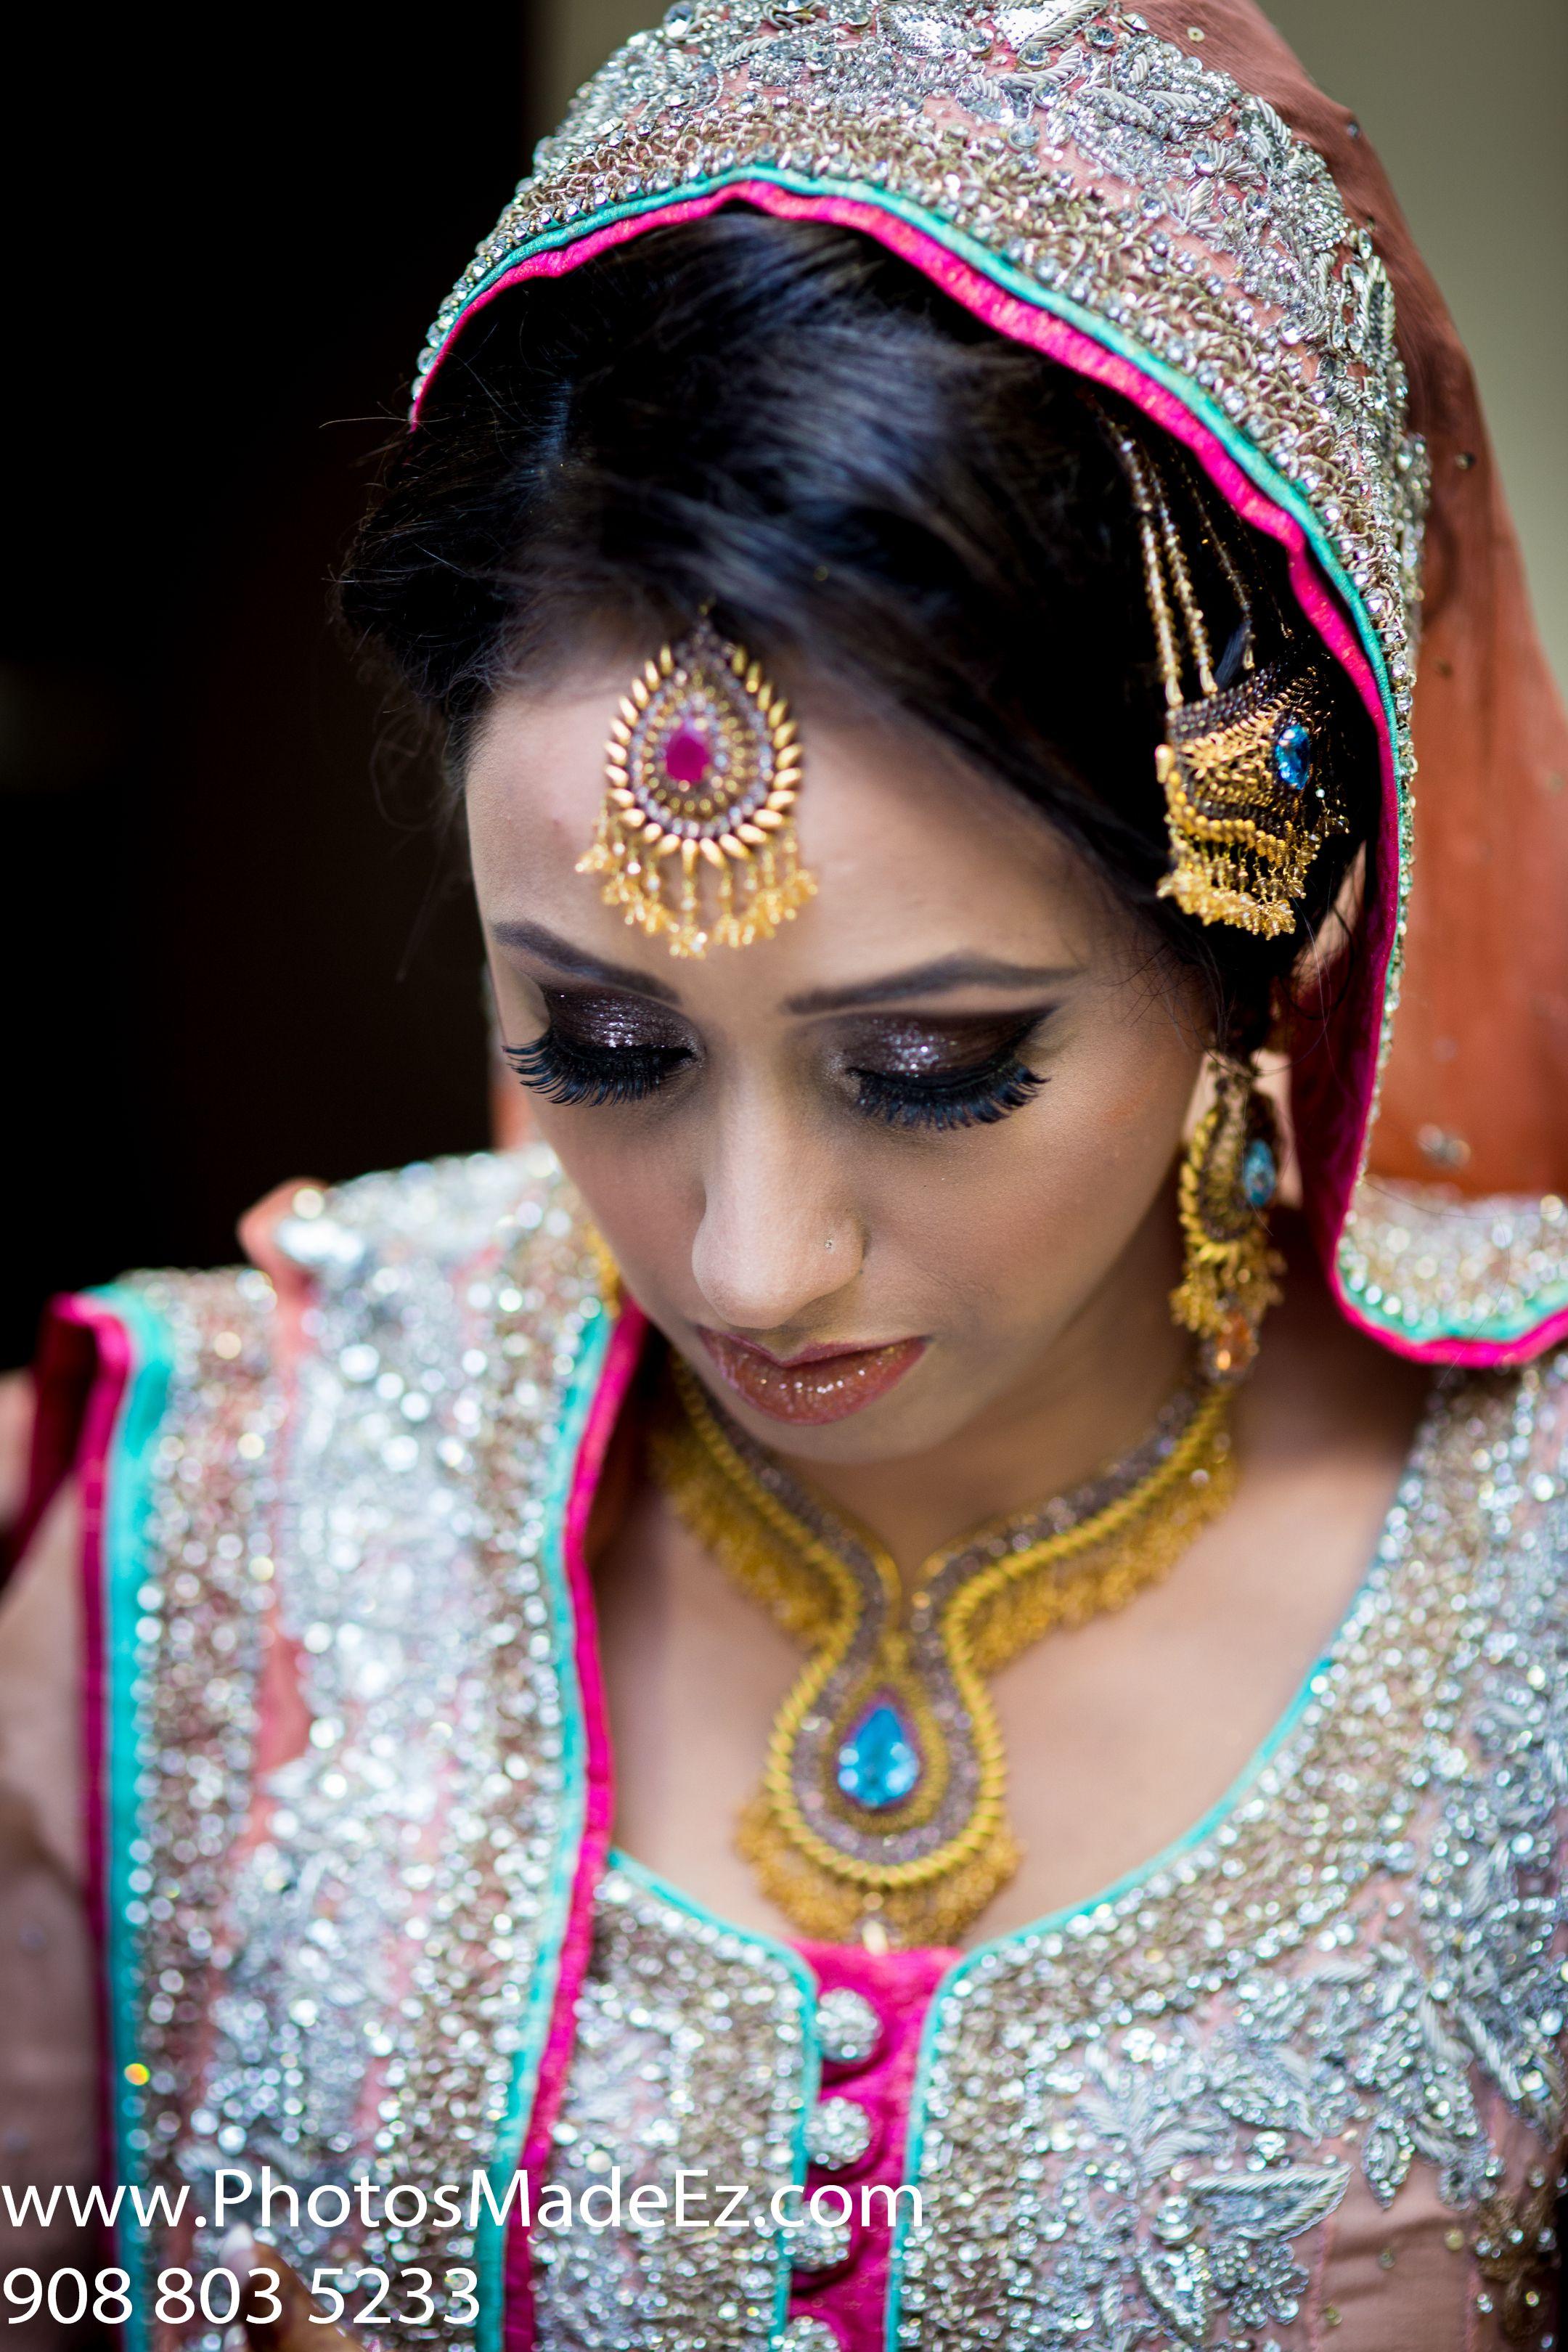 Muslim Bride In Pakistani Wedding Photographer Cinematographer PhotosMadeEz With Fellow Vendors MandapsbyDhoom Make Up Artist Long Island